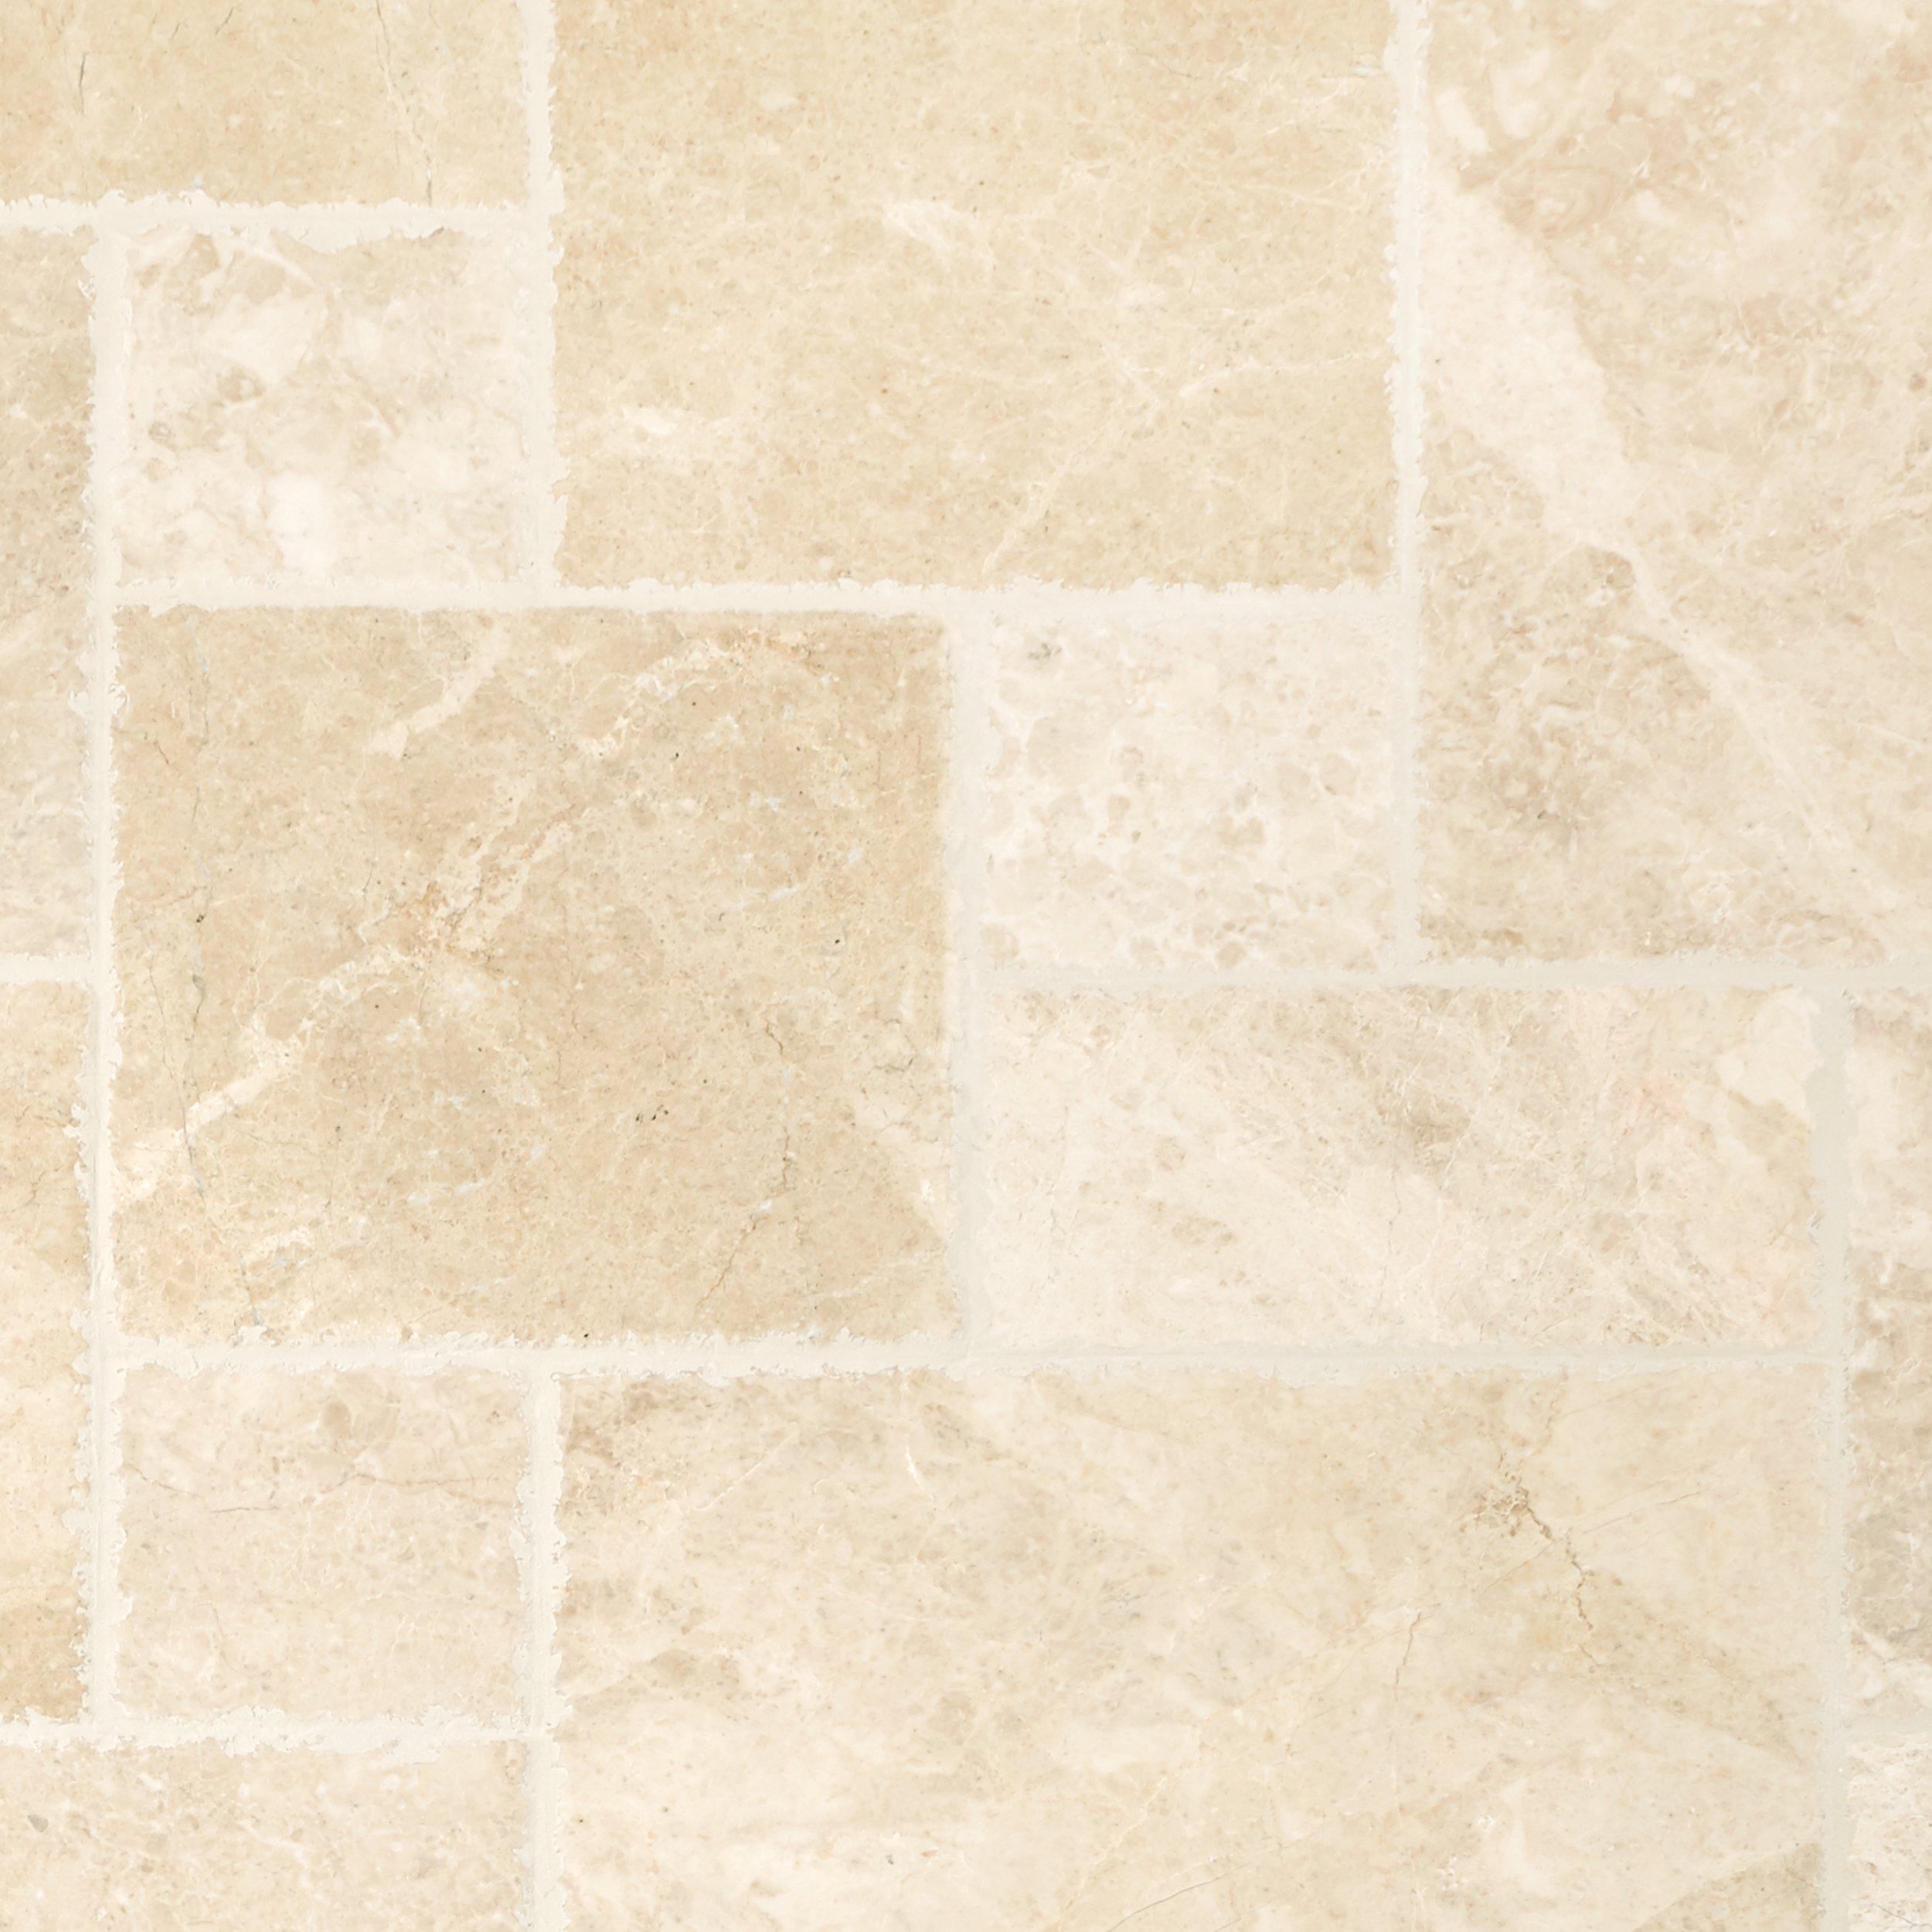 crema cappuccino marble 3 x 6 subway tiles tumbled sample marble tiles bonsaipaisajismo building supplies